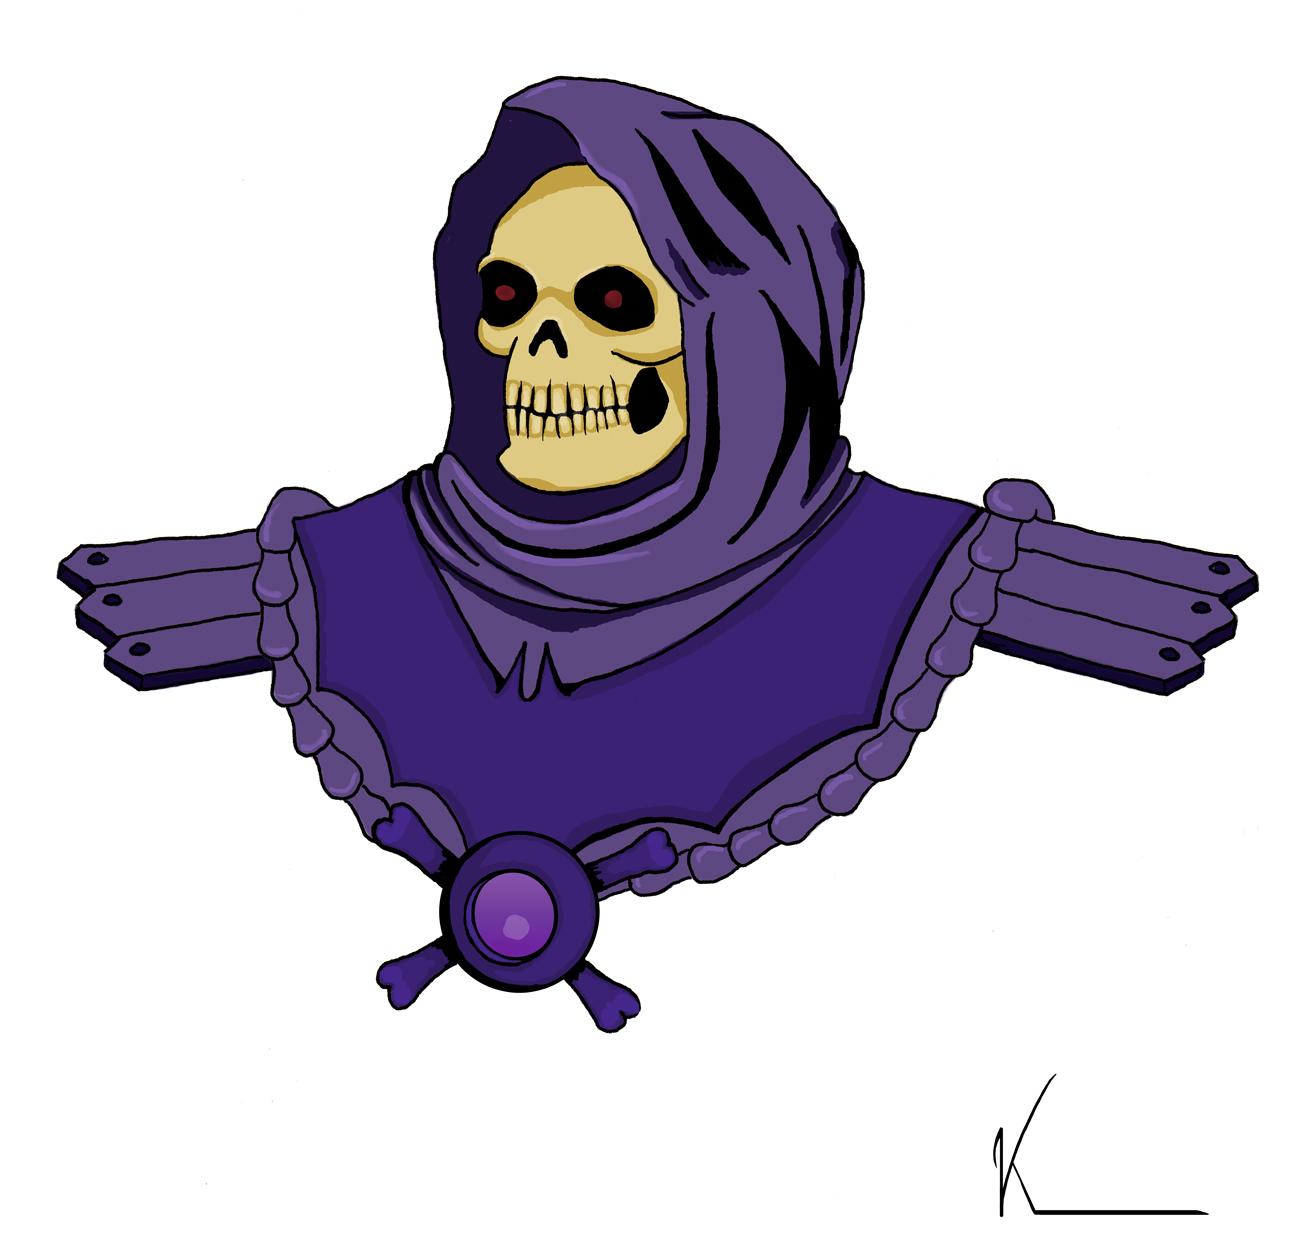 Skeletor, The Lord of Destruction by Verhelm